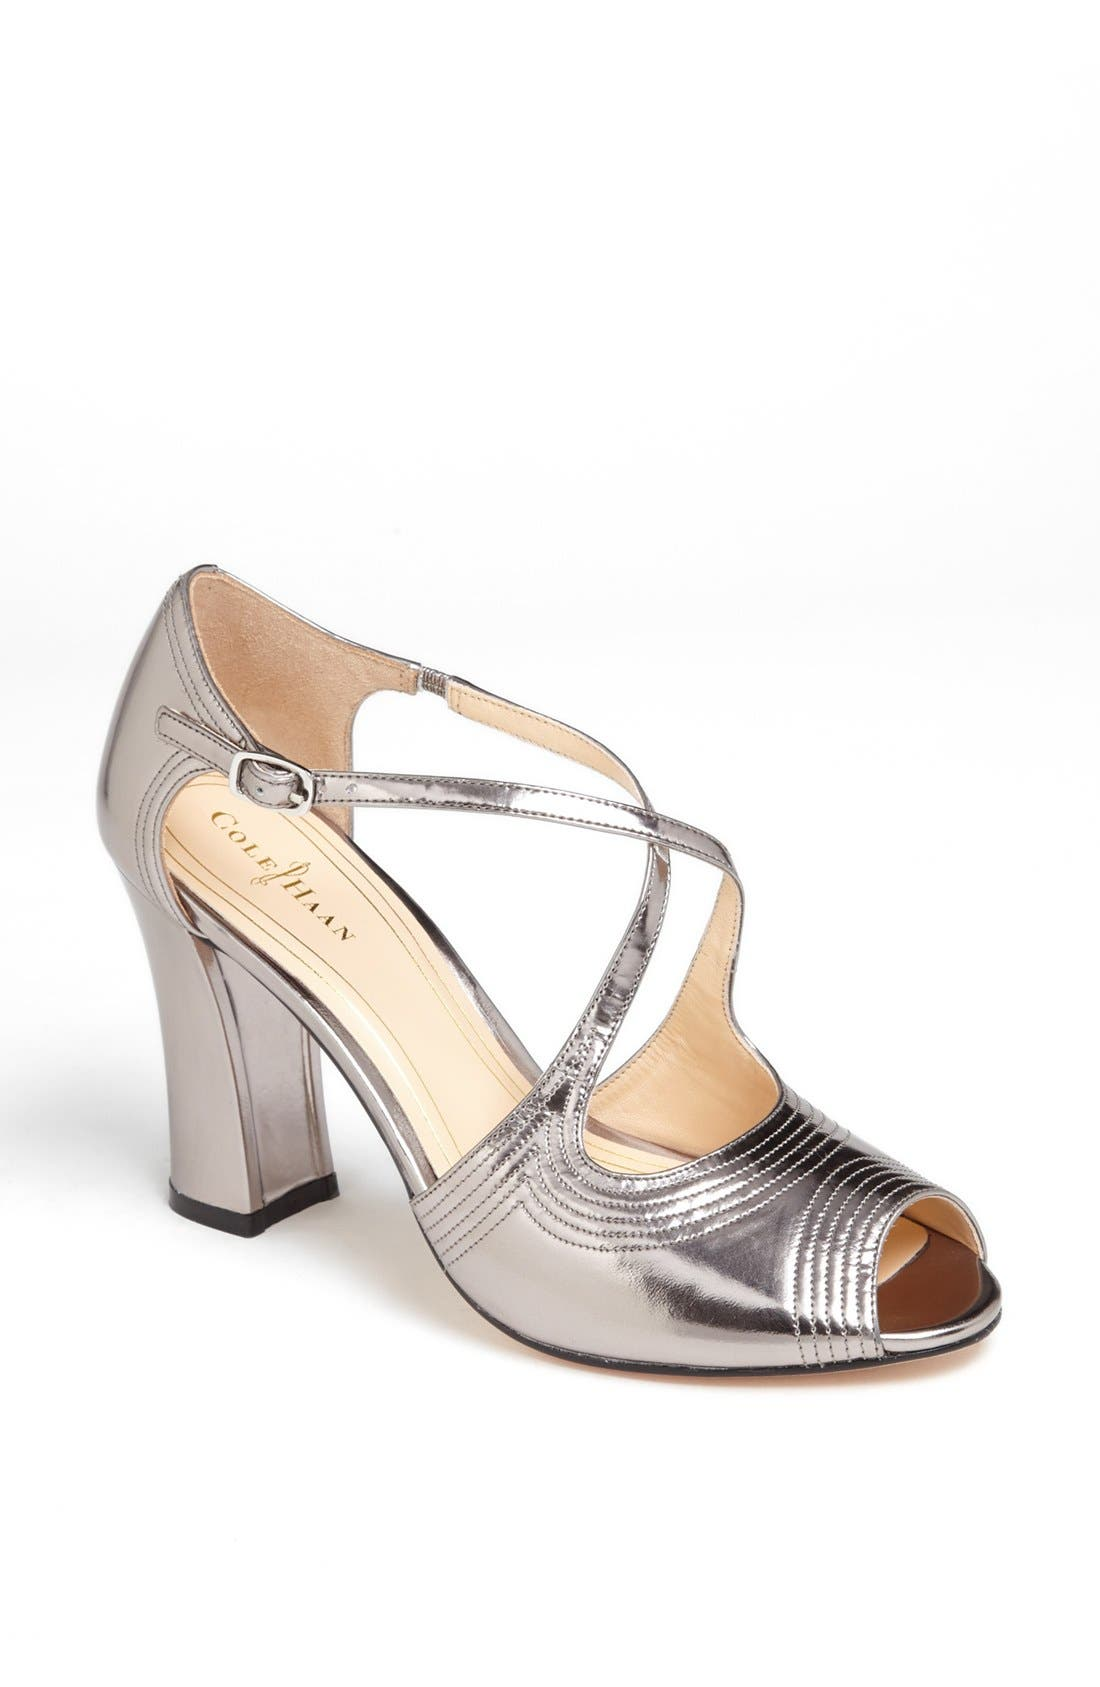 Alternate Image 1 Selected - Cole Haan 'Jovie' Mirrored Sandal